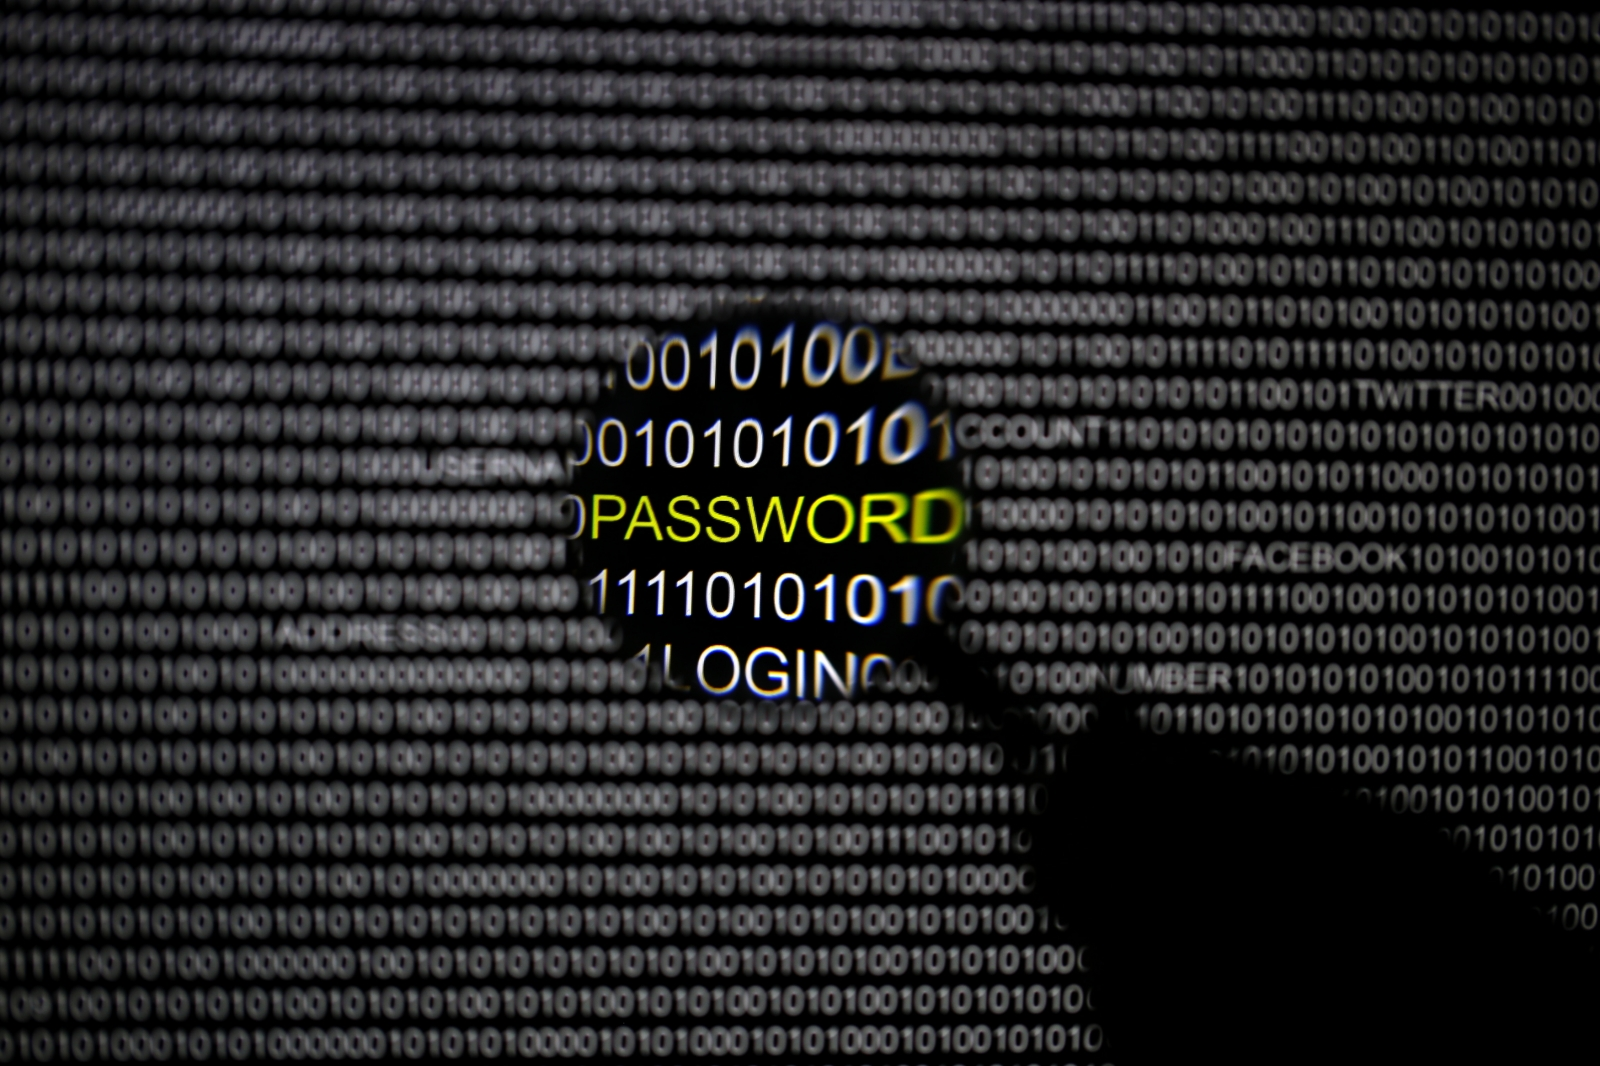 Facebook and Netflix discretely begin password resets following massive multiple breaches